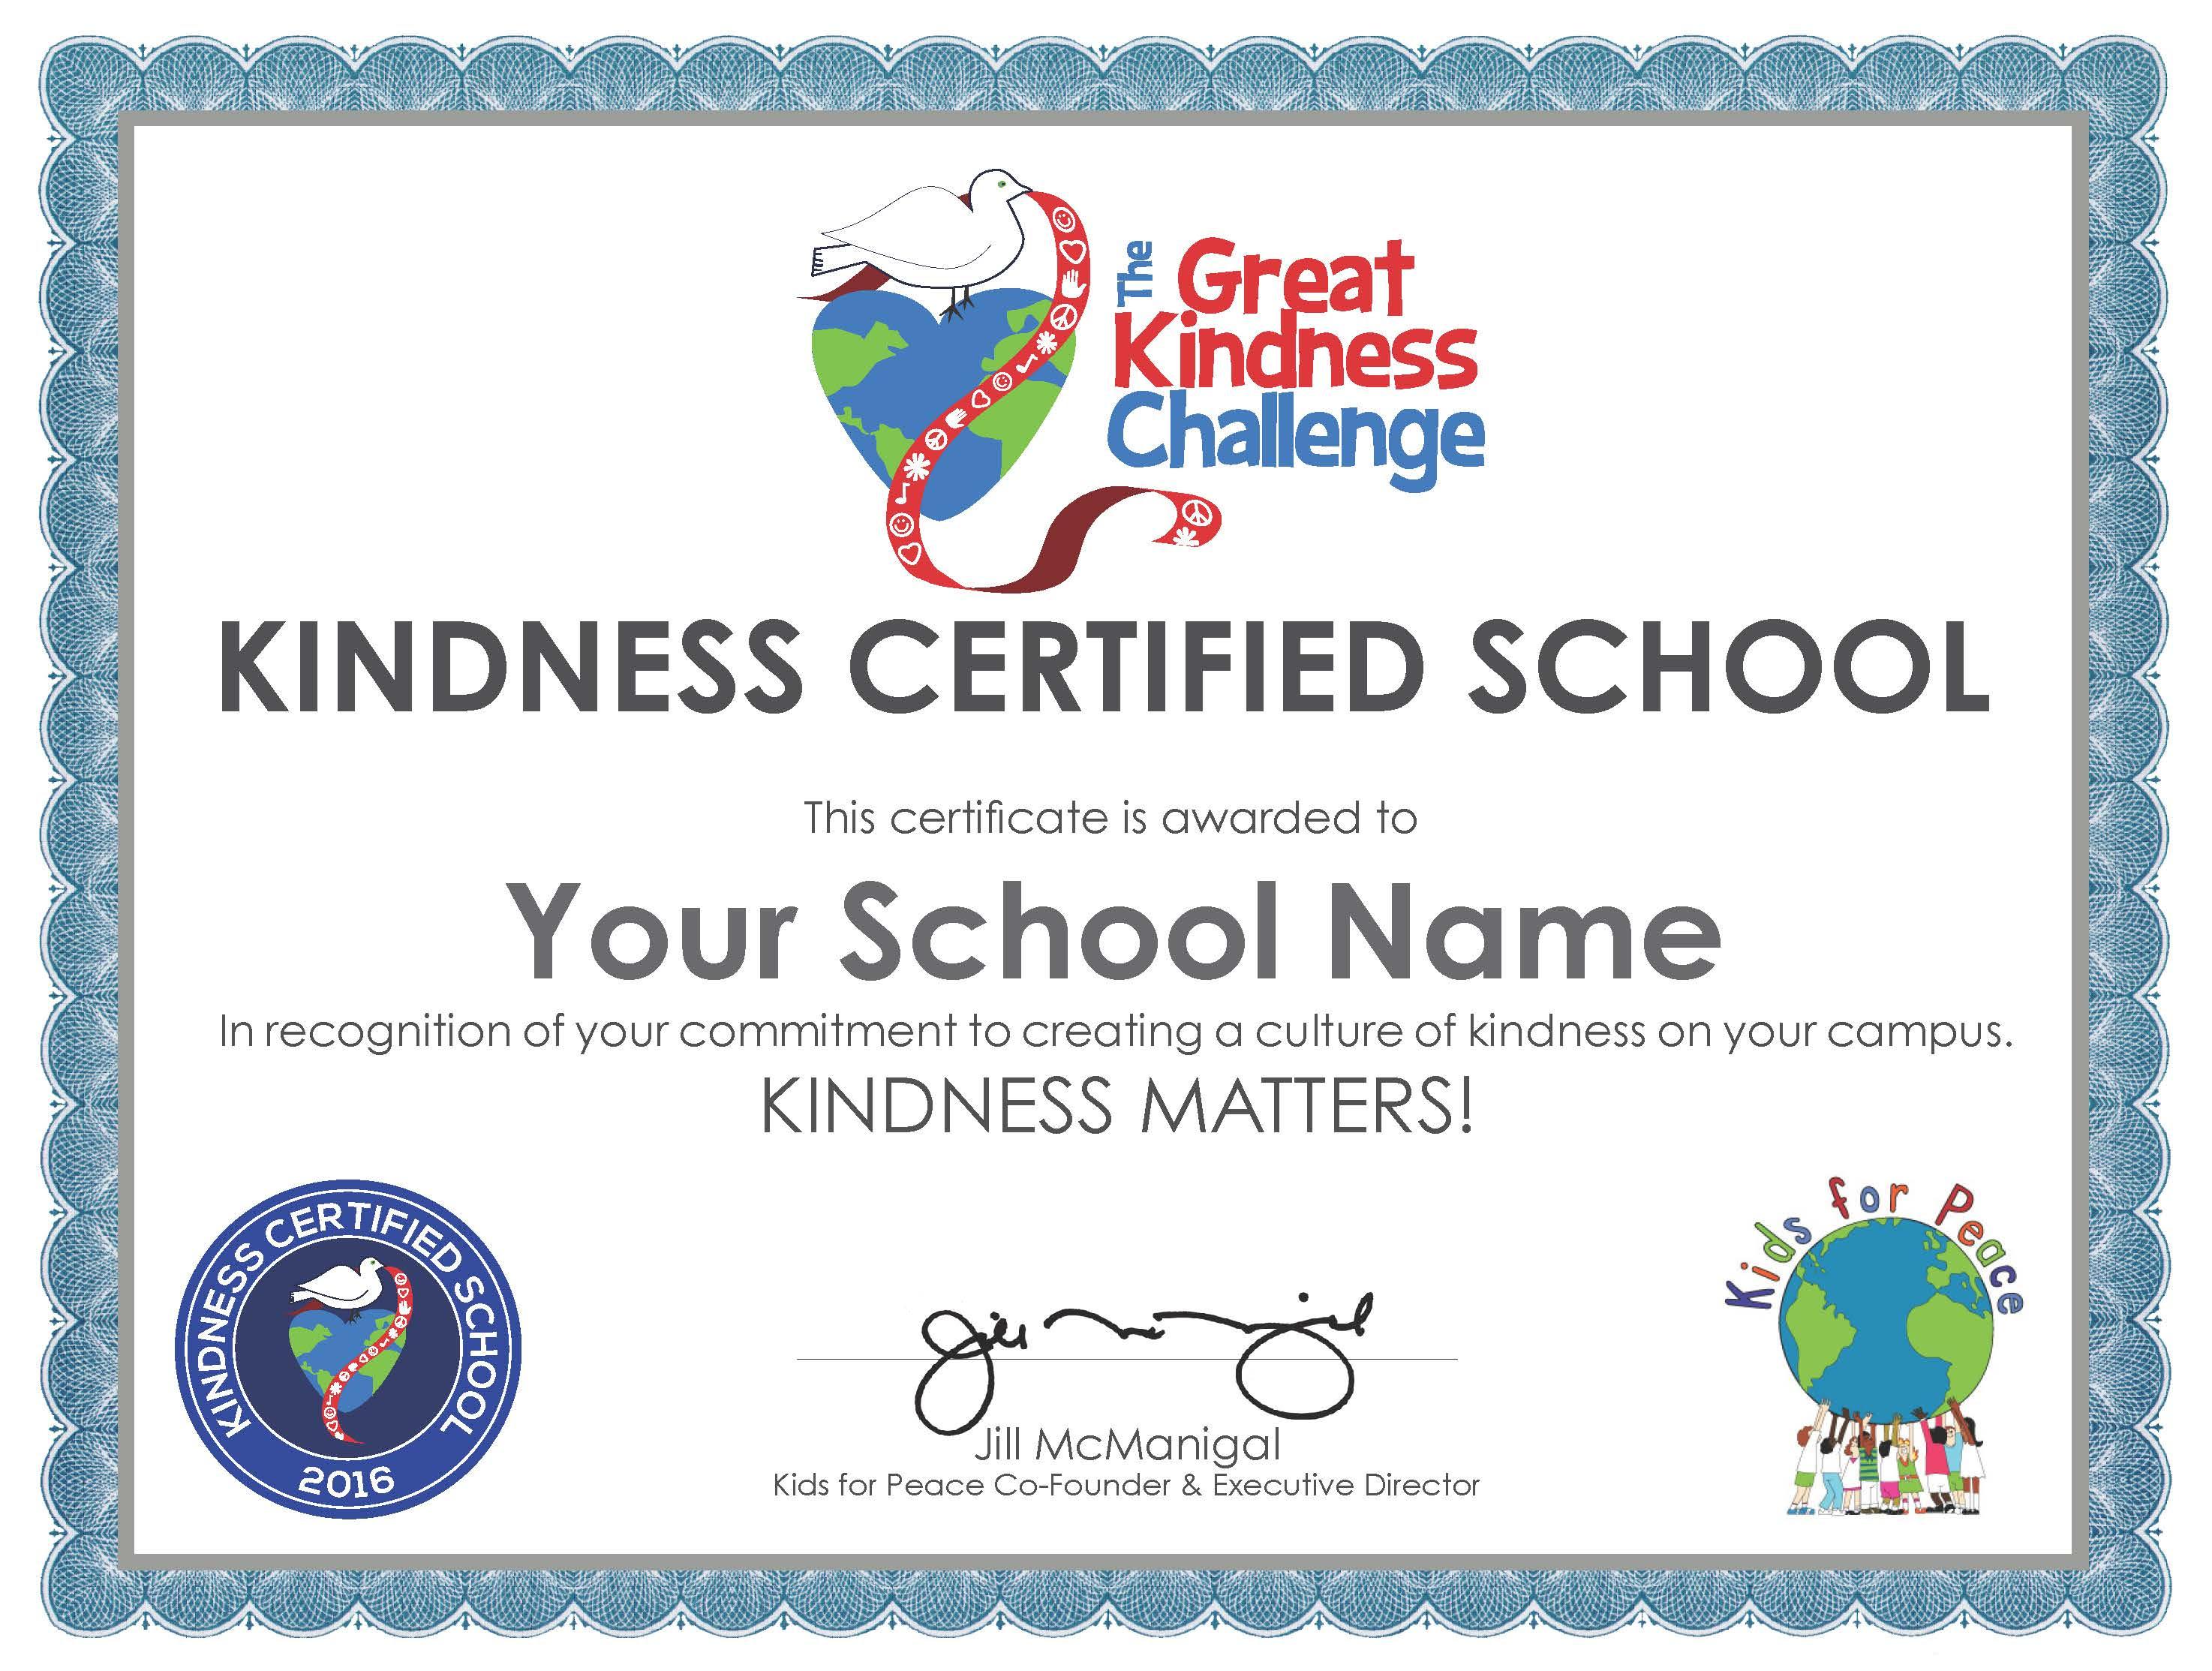 School certify image